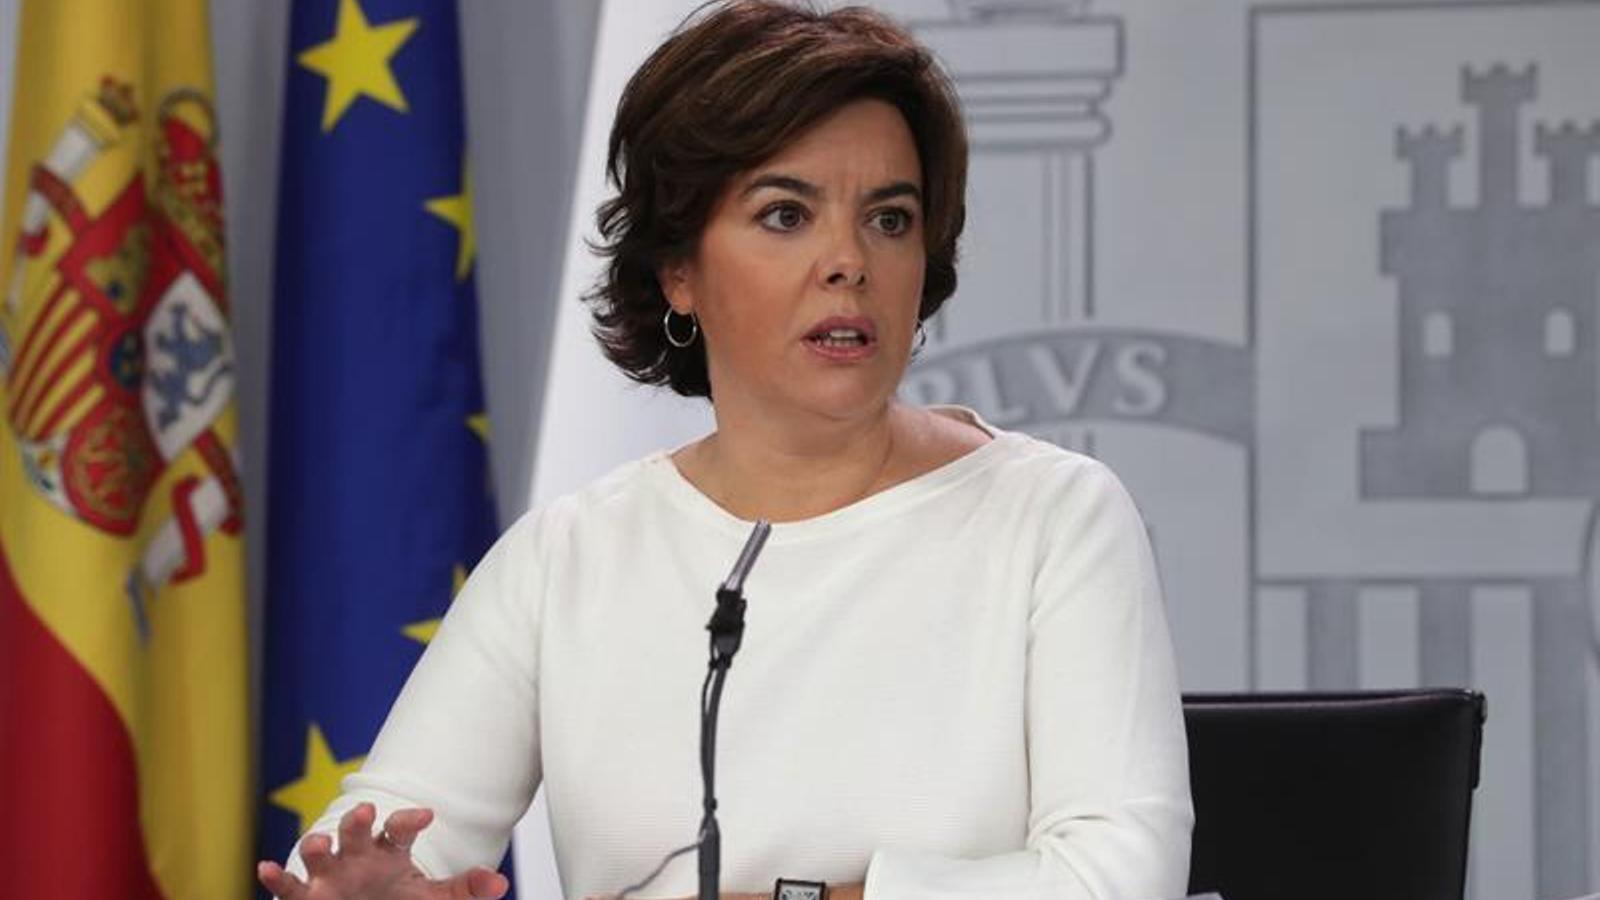 Soraya Sáenz de Santamaría compareix a la Moncloa